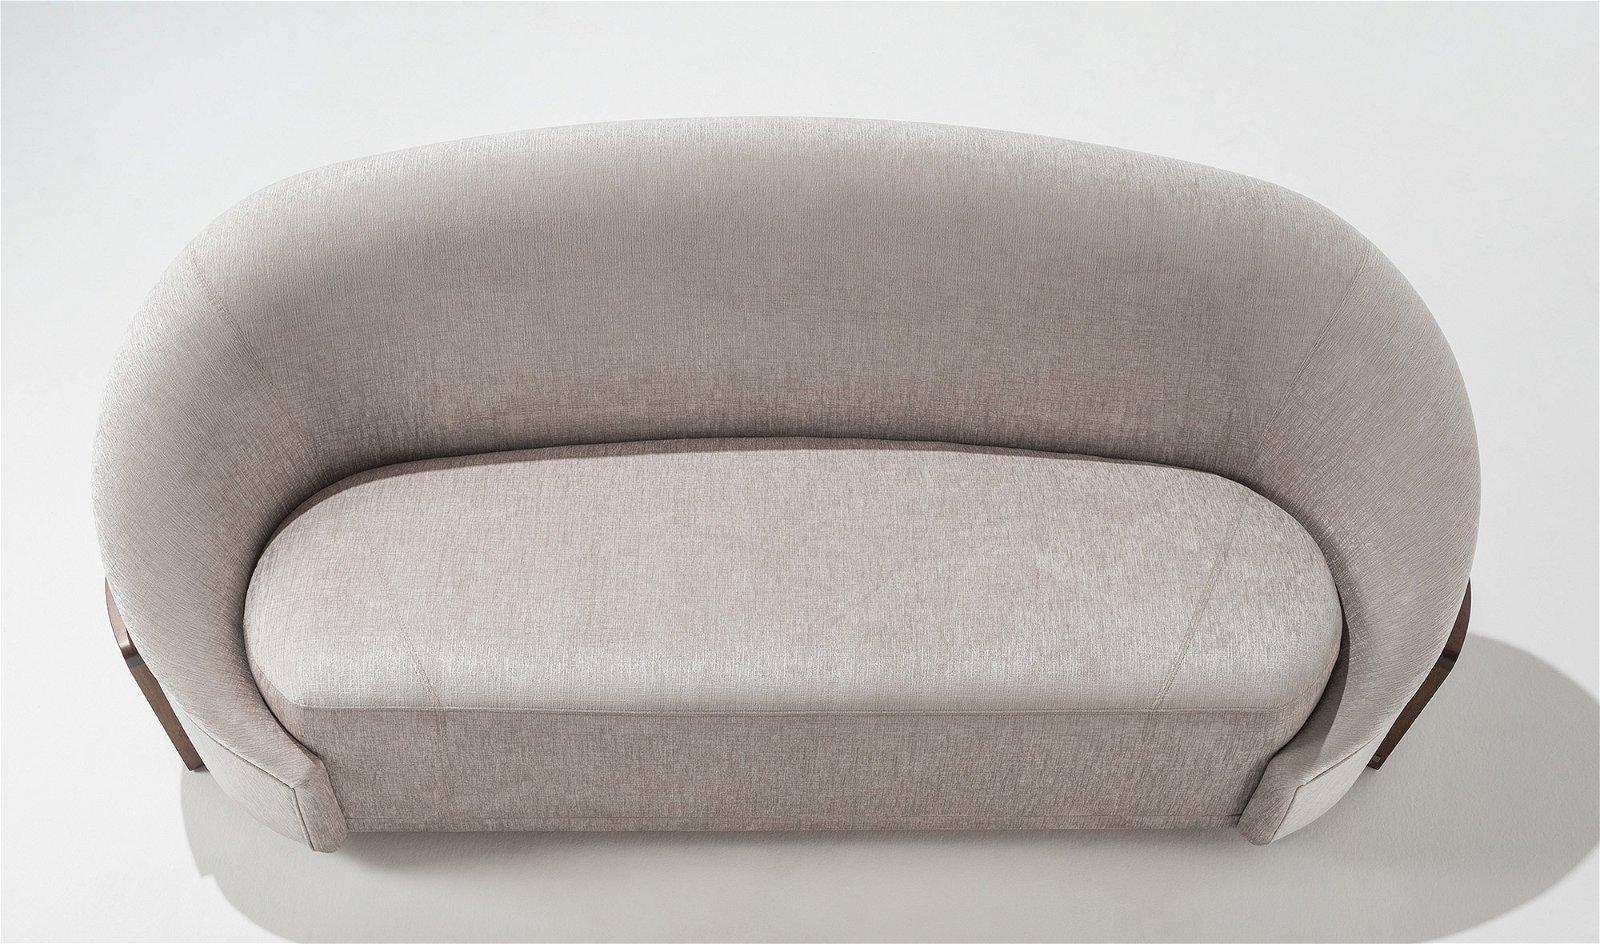 Sofá curvo moderno Rumba Adriana Hoyos